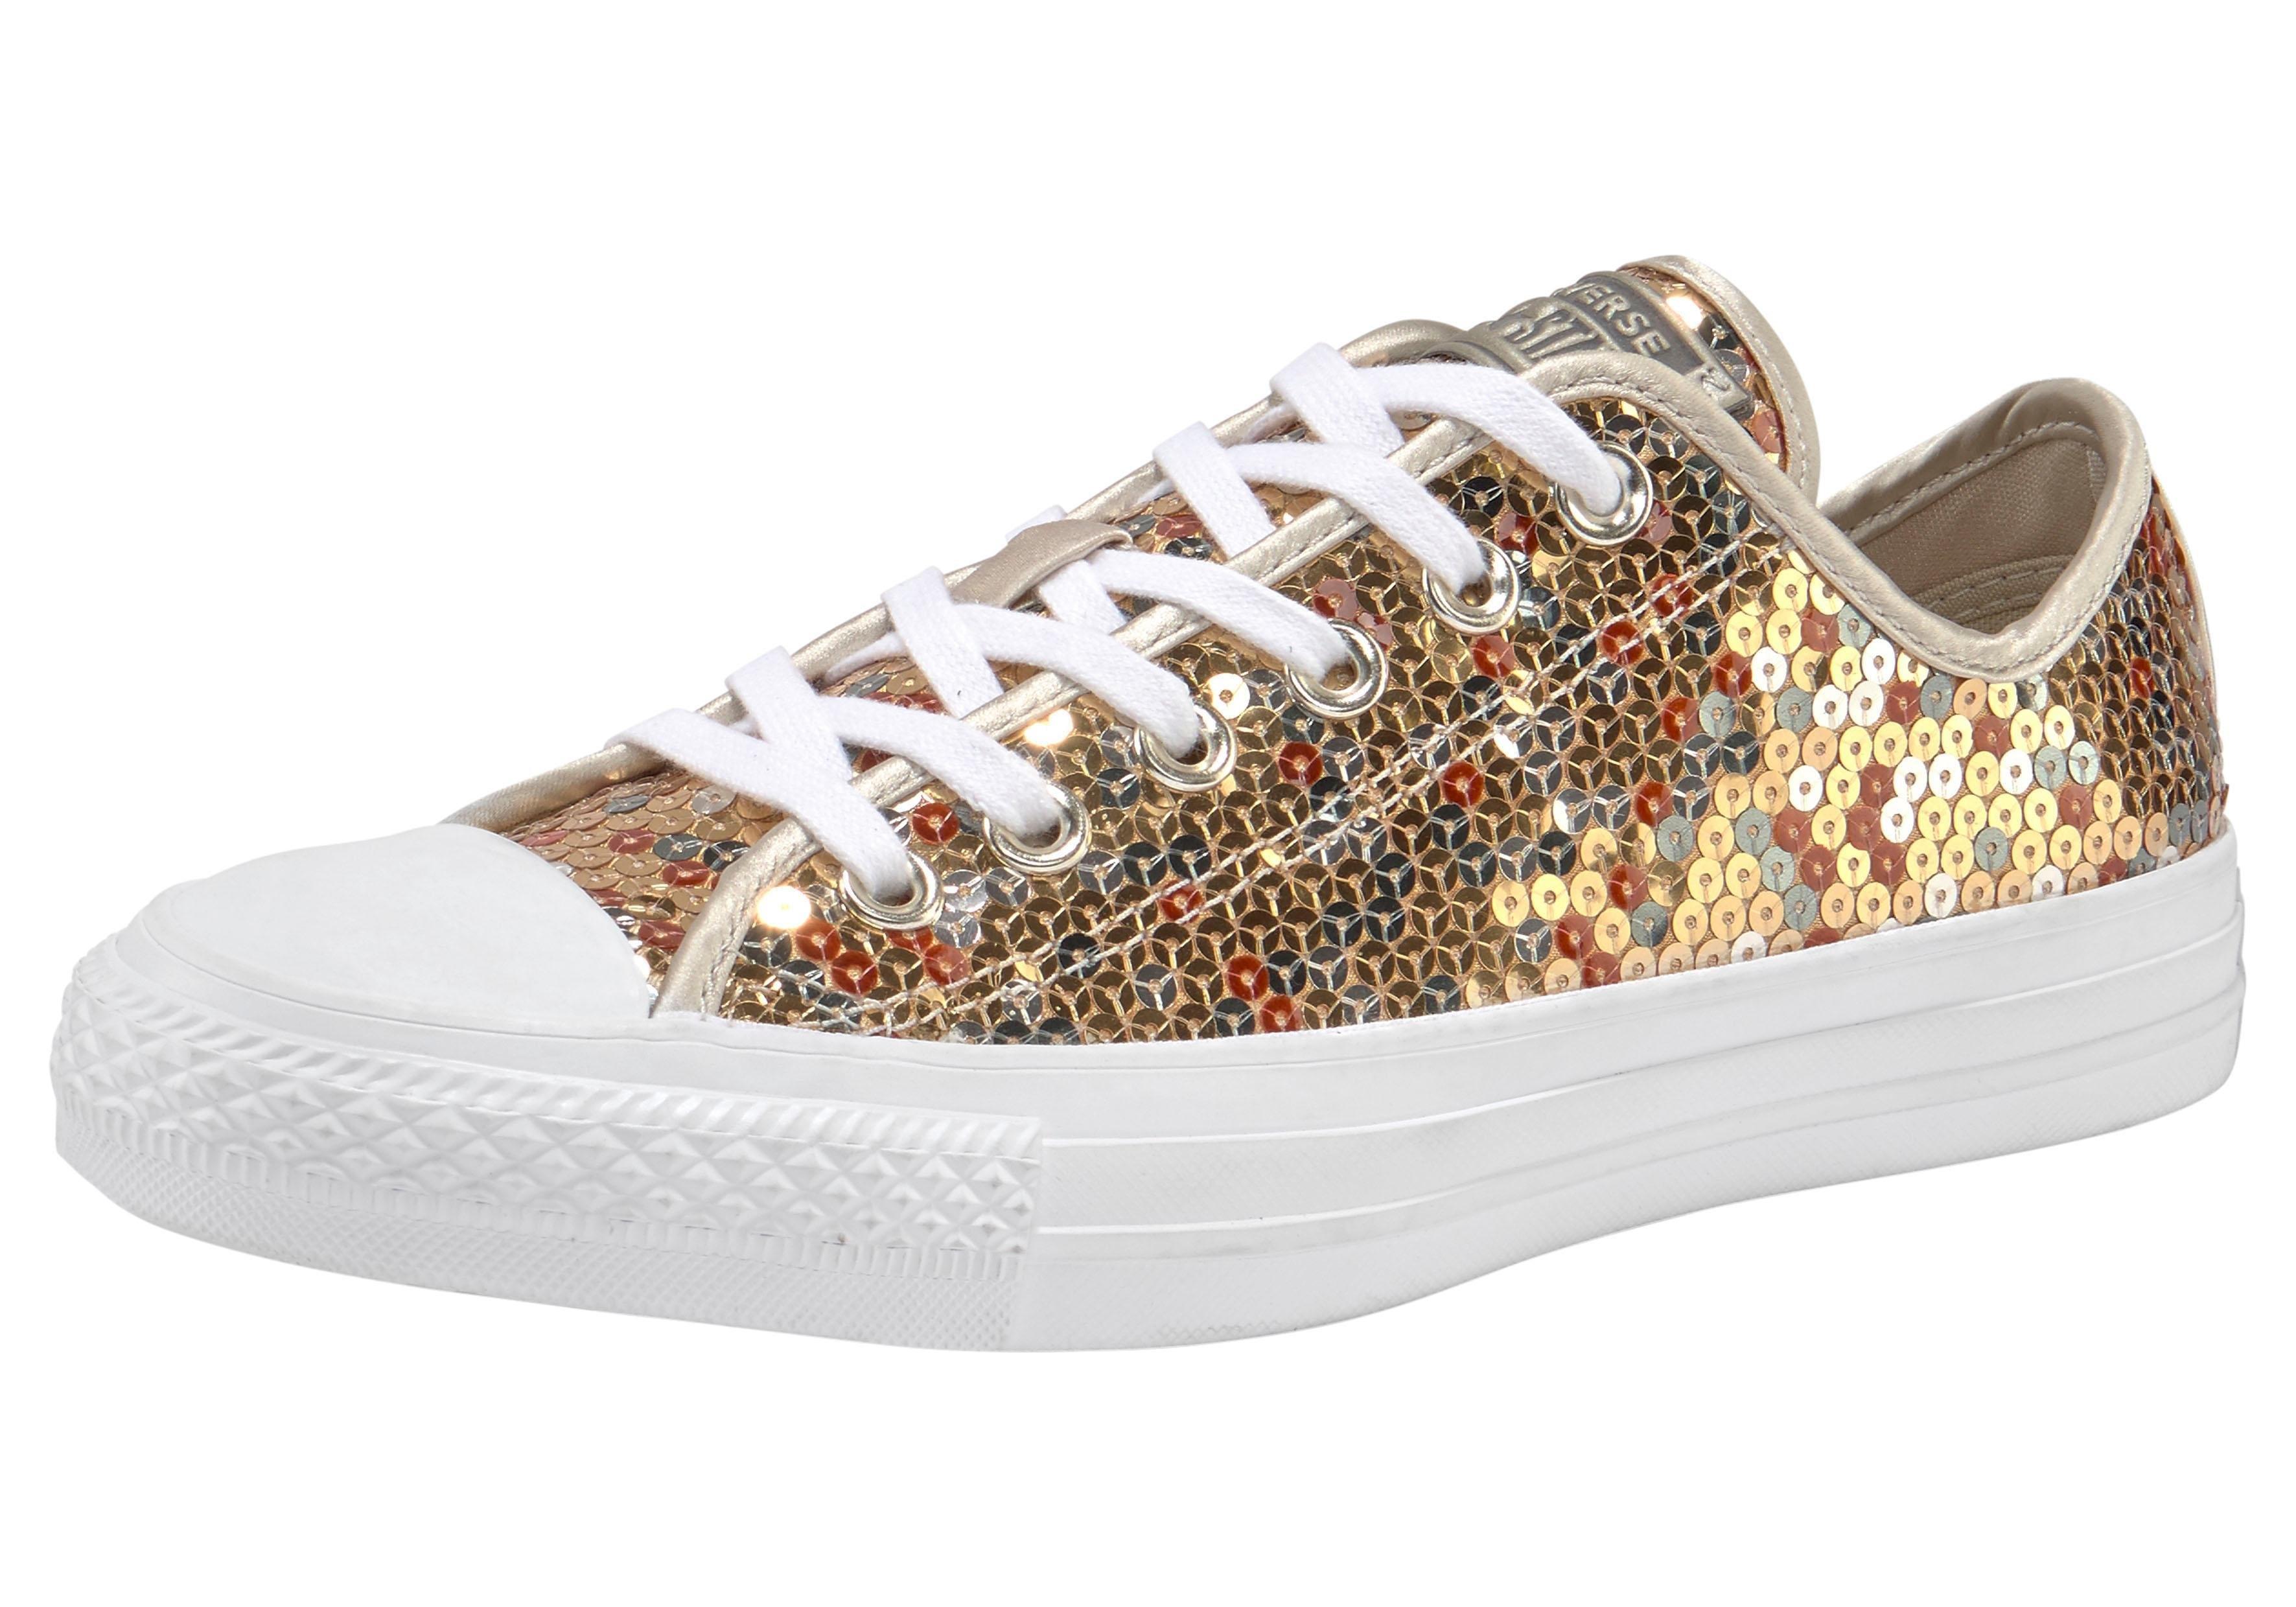 733643d2727a3 Afbeeldingsbron  Converse sneakers »Chuck Taylor All Star Ox Pailletten«